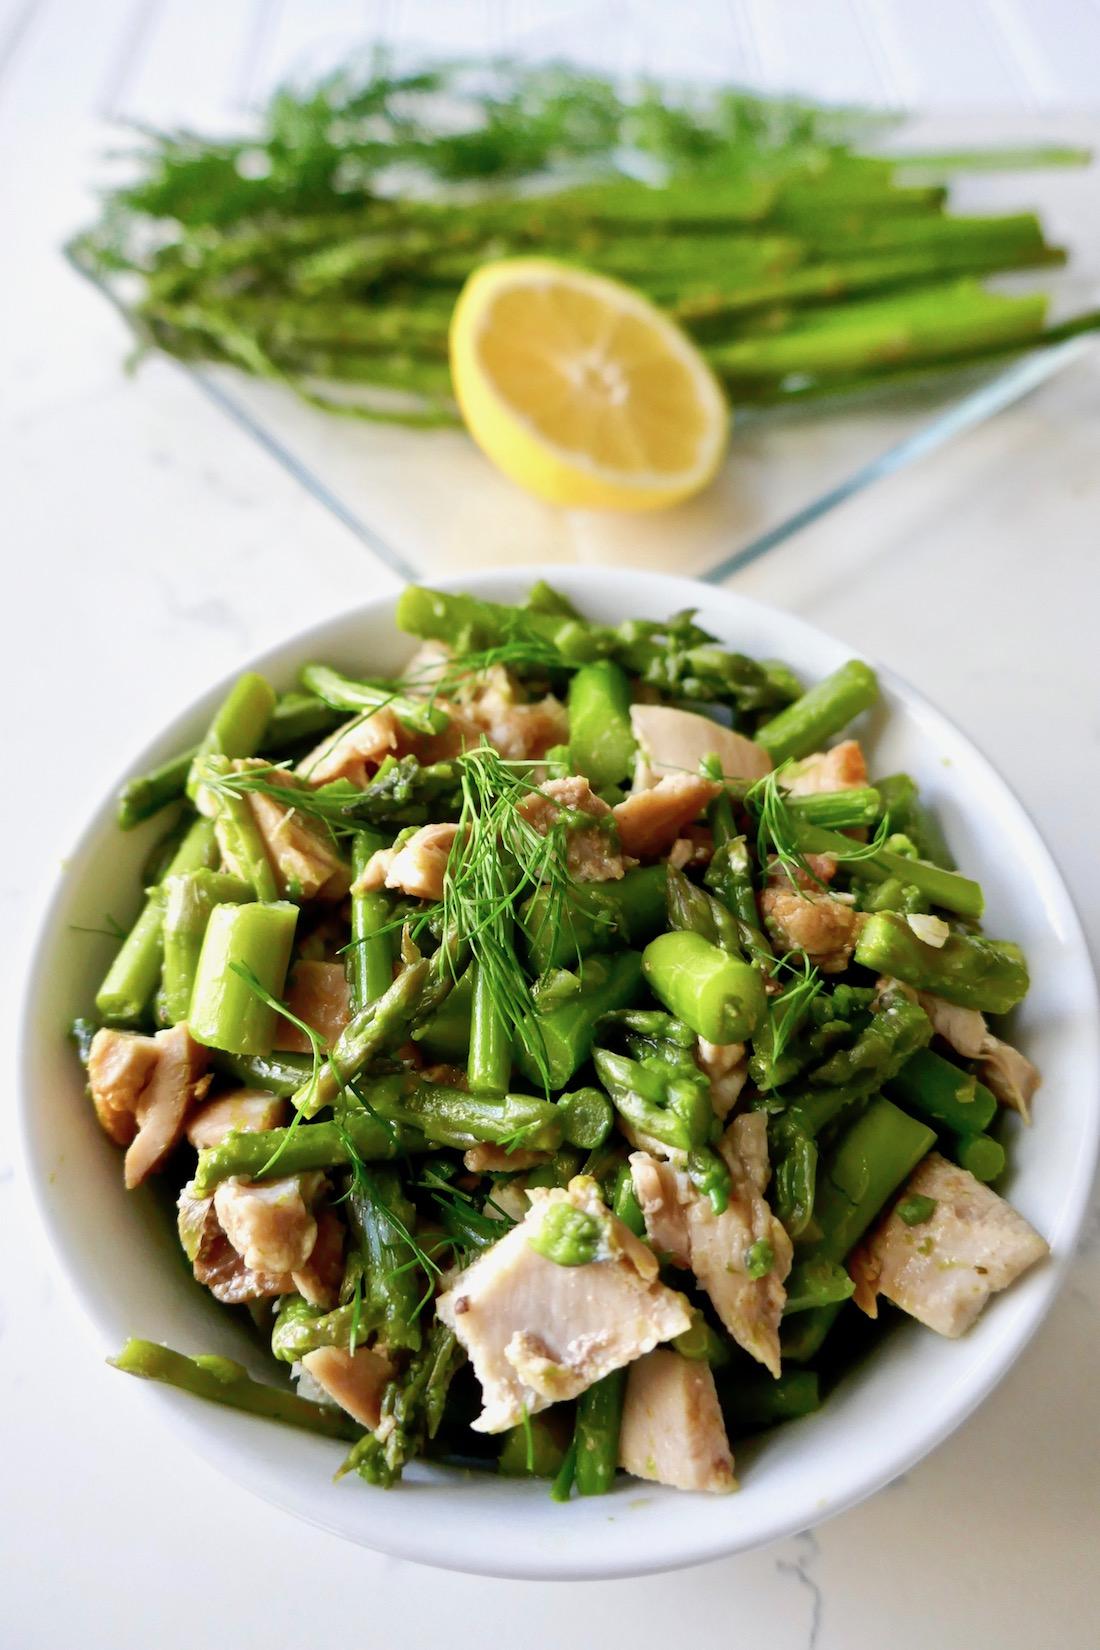 Avocado asparagus chicken salad - paleo, gluten free, dairy free, mayo free